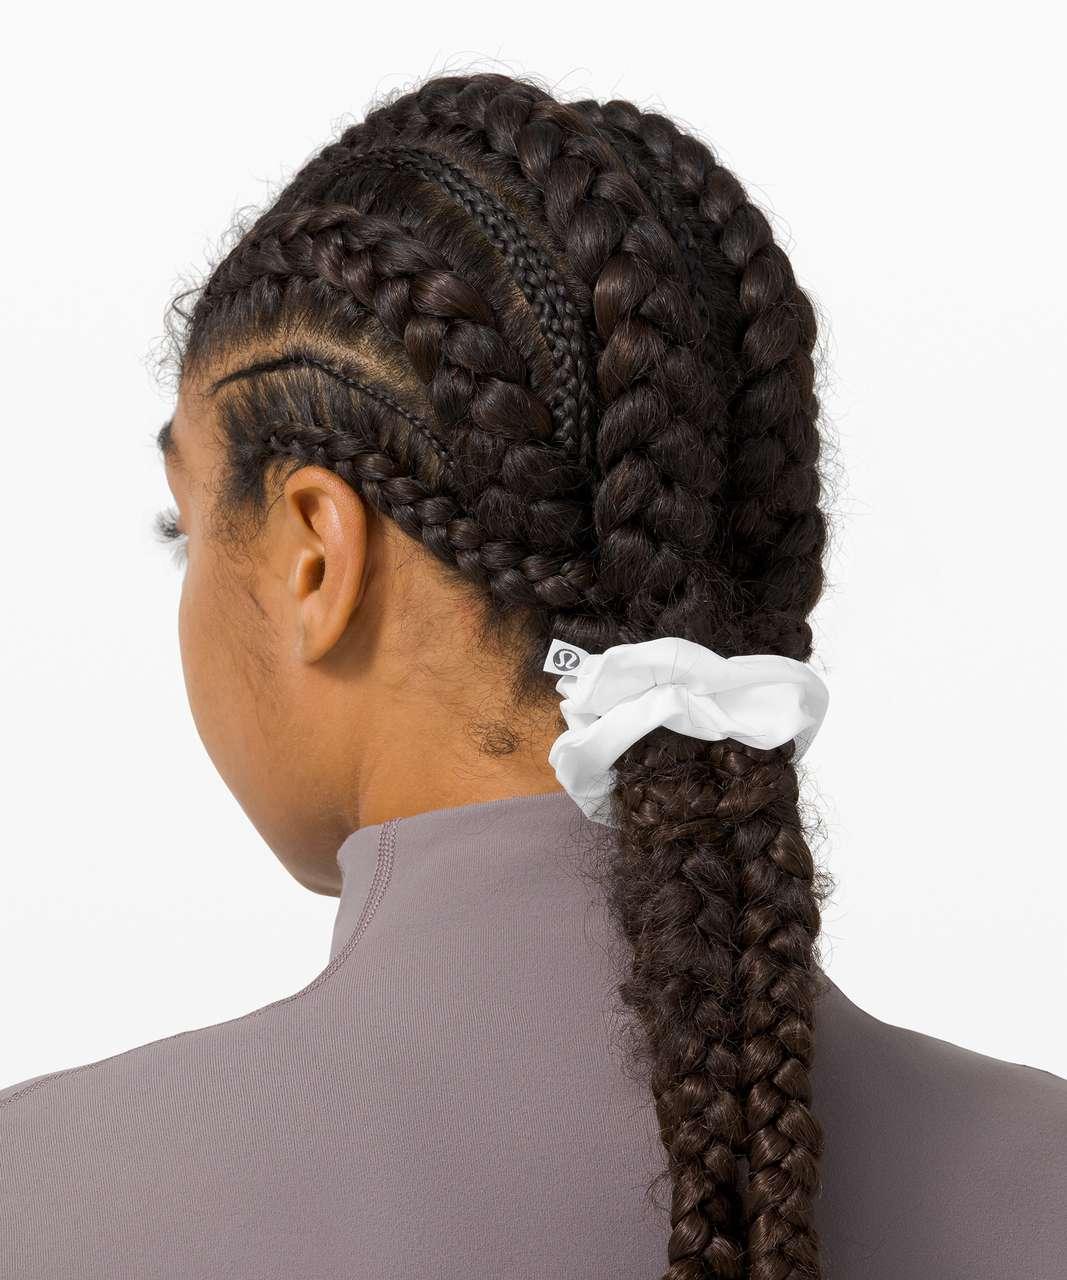 Lululemon Uplifting Scrunchie - Poco Logo Foil White